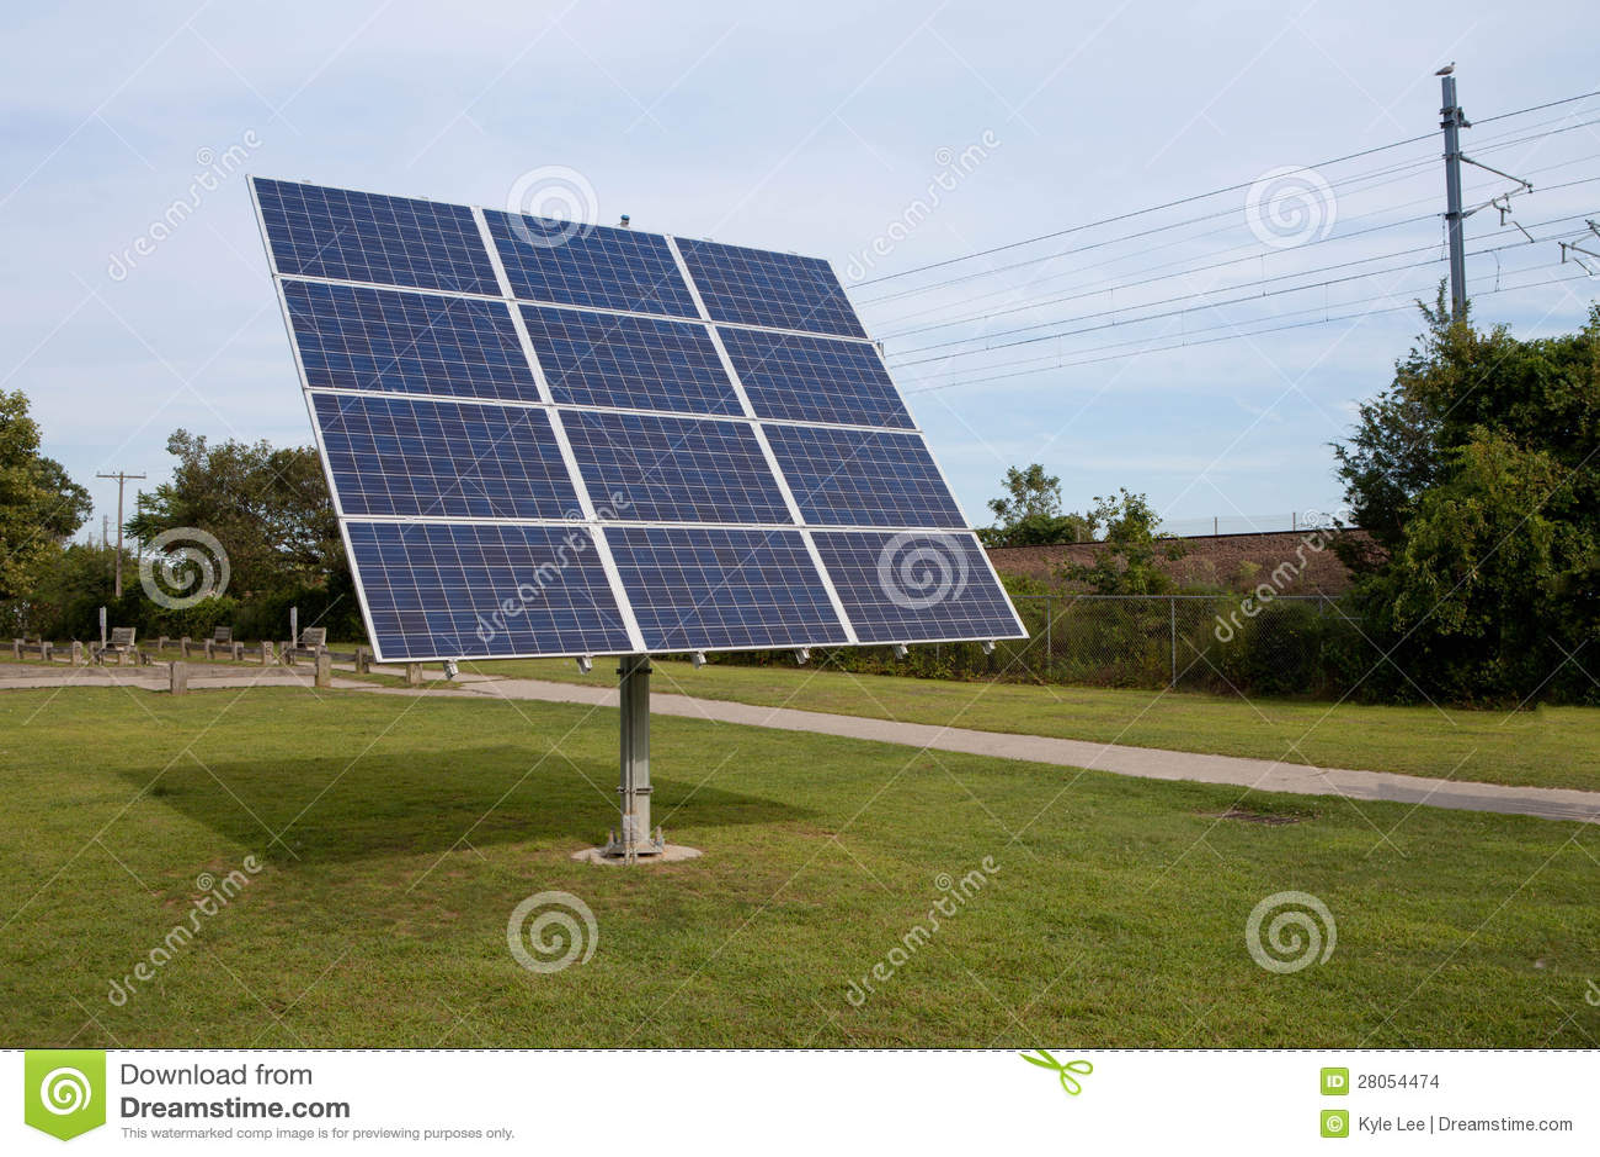 Rotating Solar Panels Stock Photo Image Of Efficiency